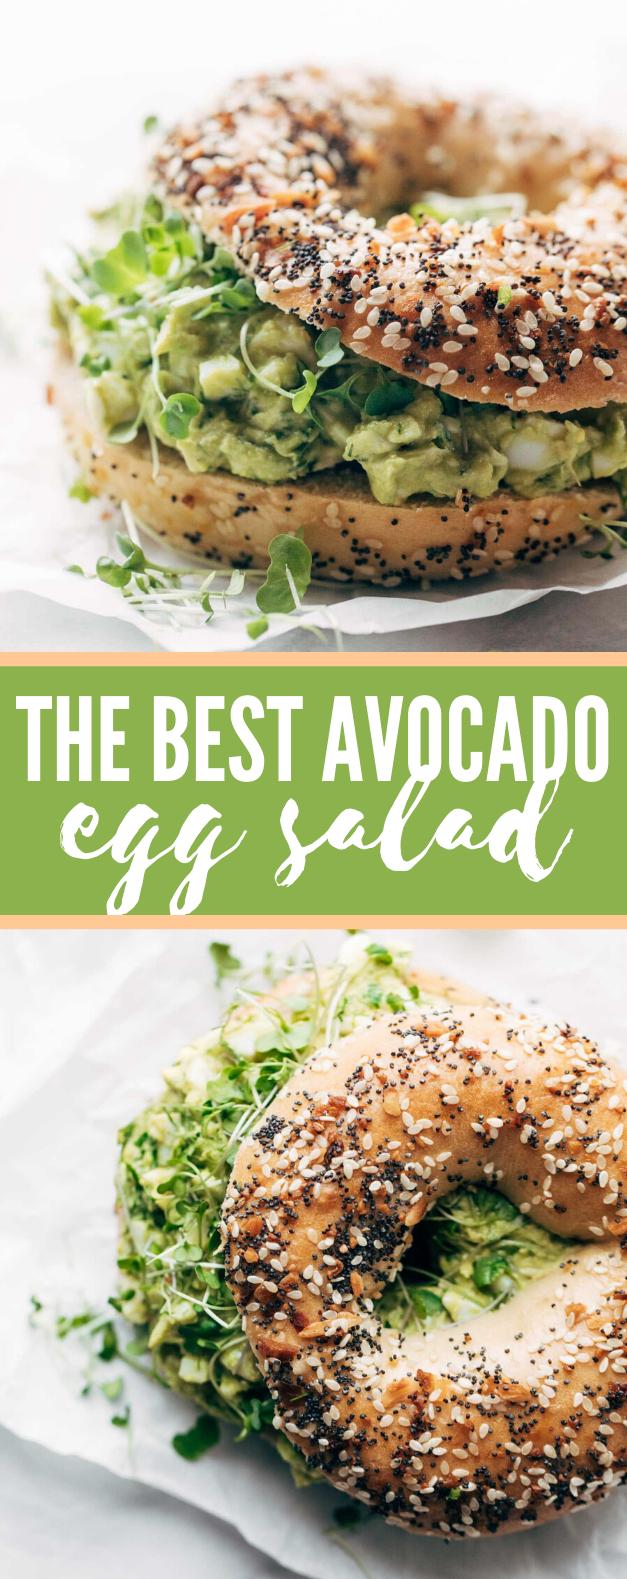 the best avocado egg salad #vegetarian #healthy #salad #veggies #avocado